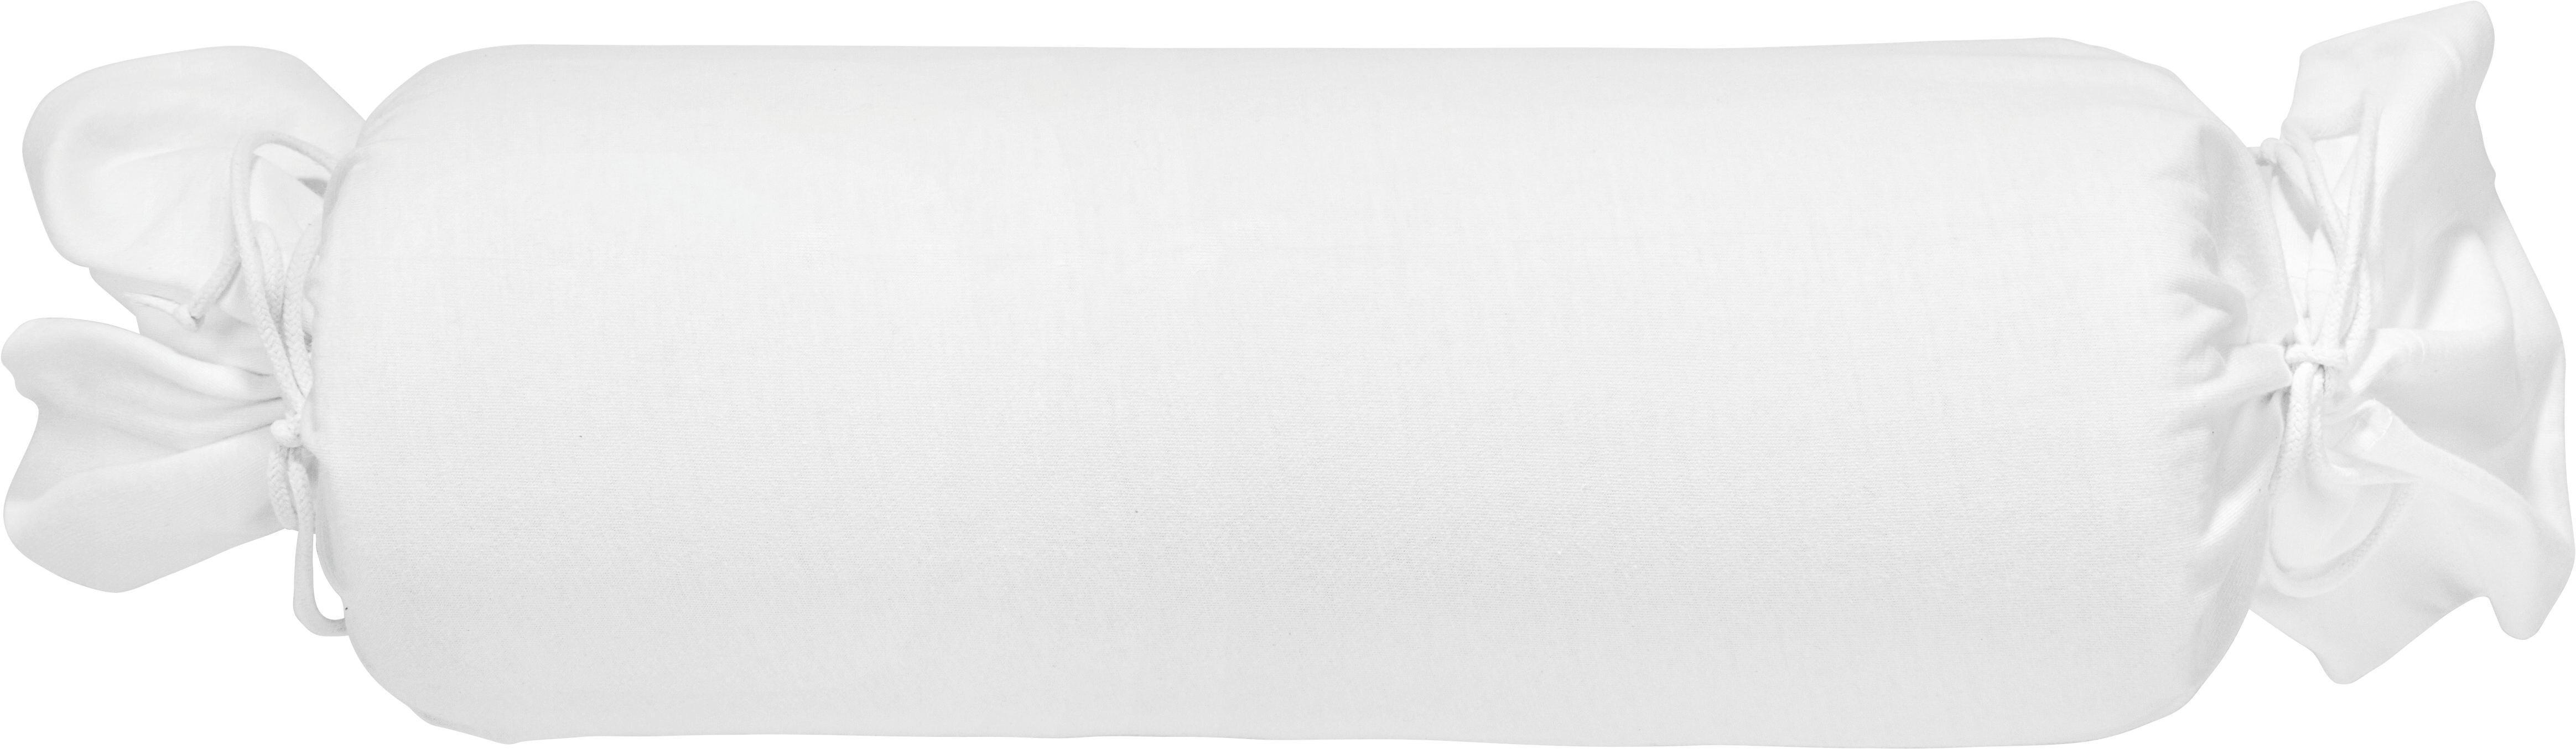 Povlak Na Polštář Basic - bílá, textil (15/40cm) - MÖMAX modern living